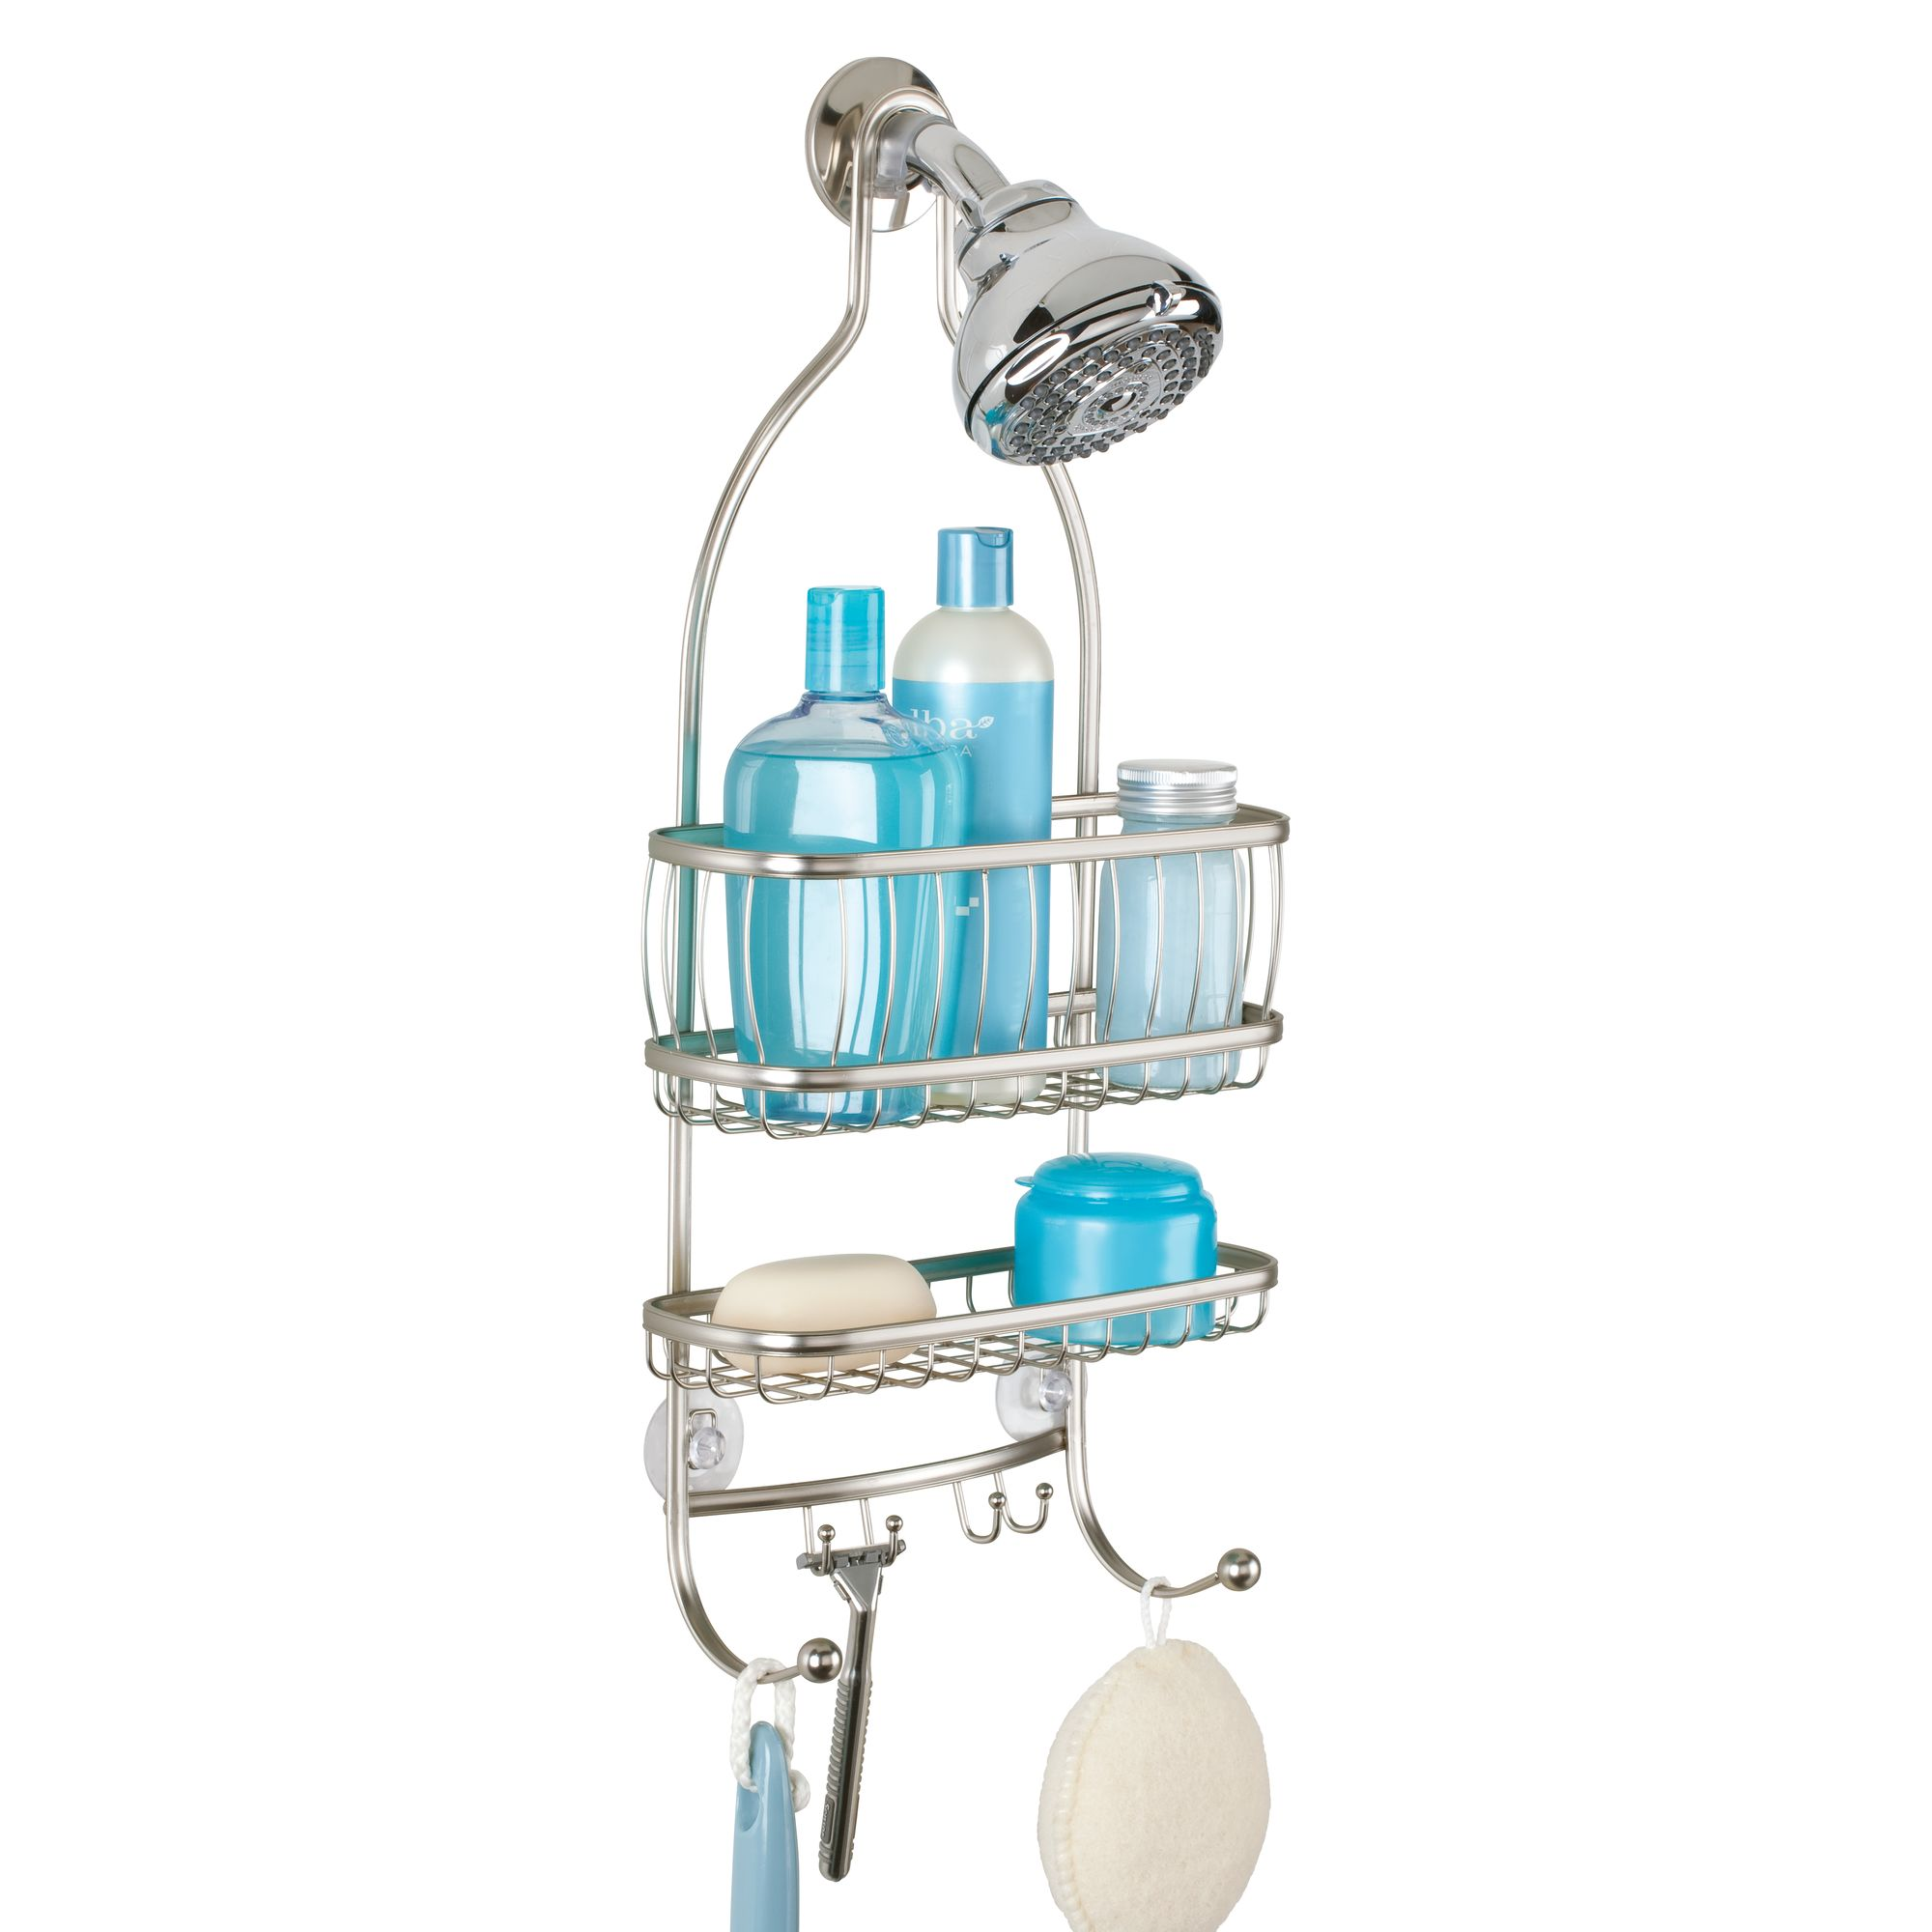 InterDesign York Lyra Shower Caddy - Walmart.com